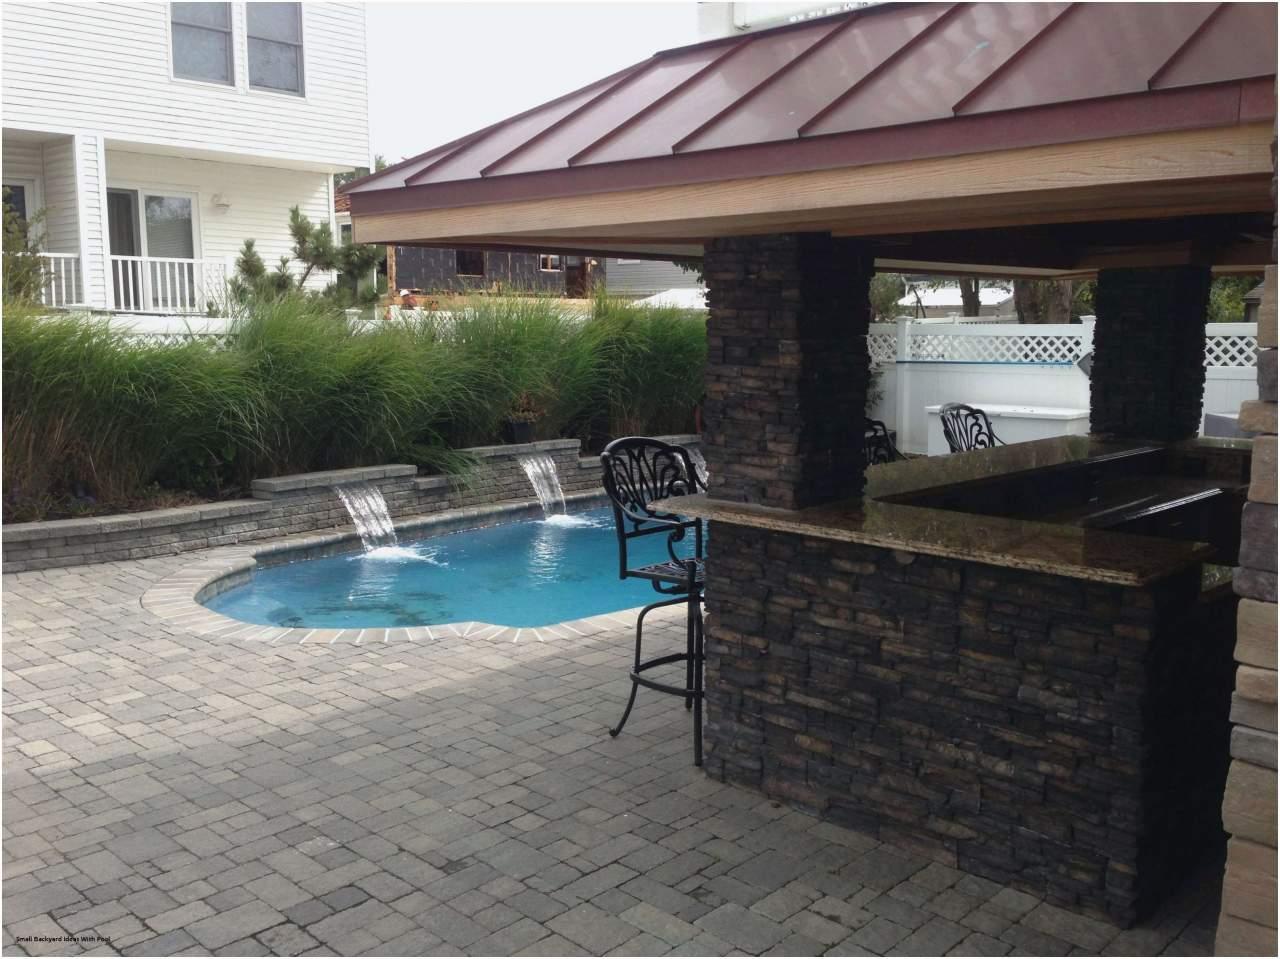 backyard patio designs diy backyard ideas beautiful wedding decore 0d design cheap wedding durch backyard patio designs